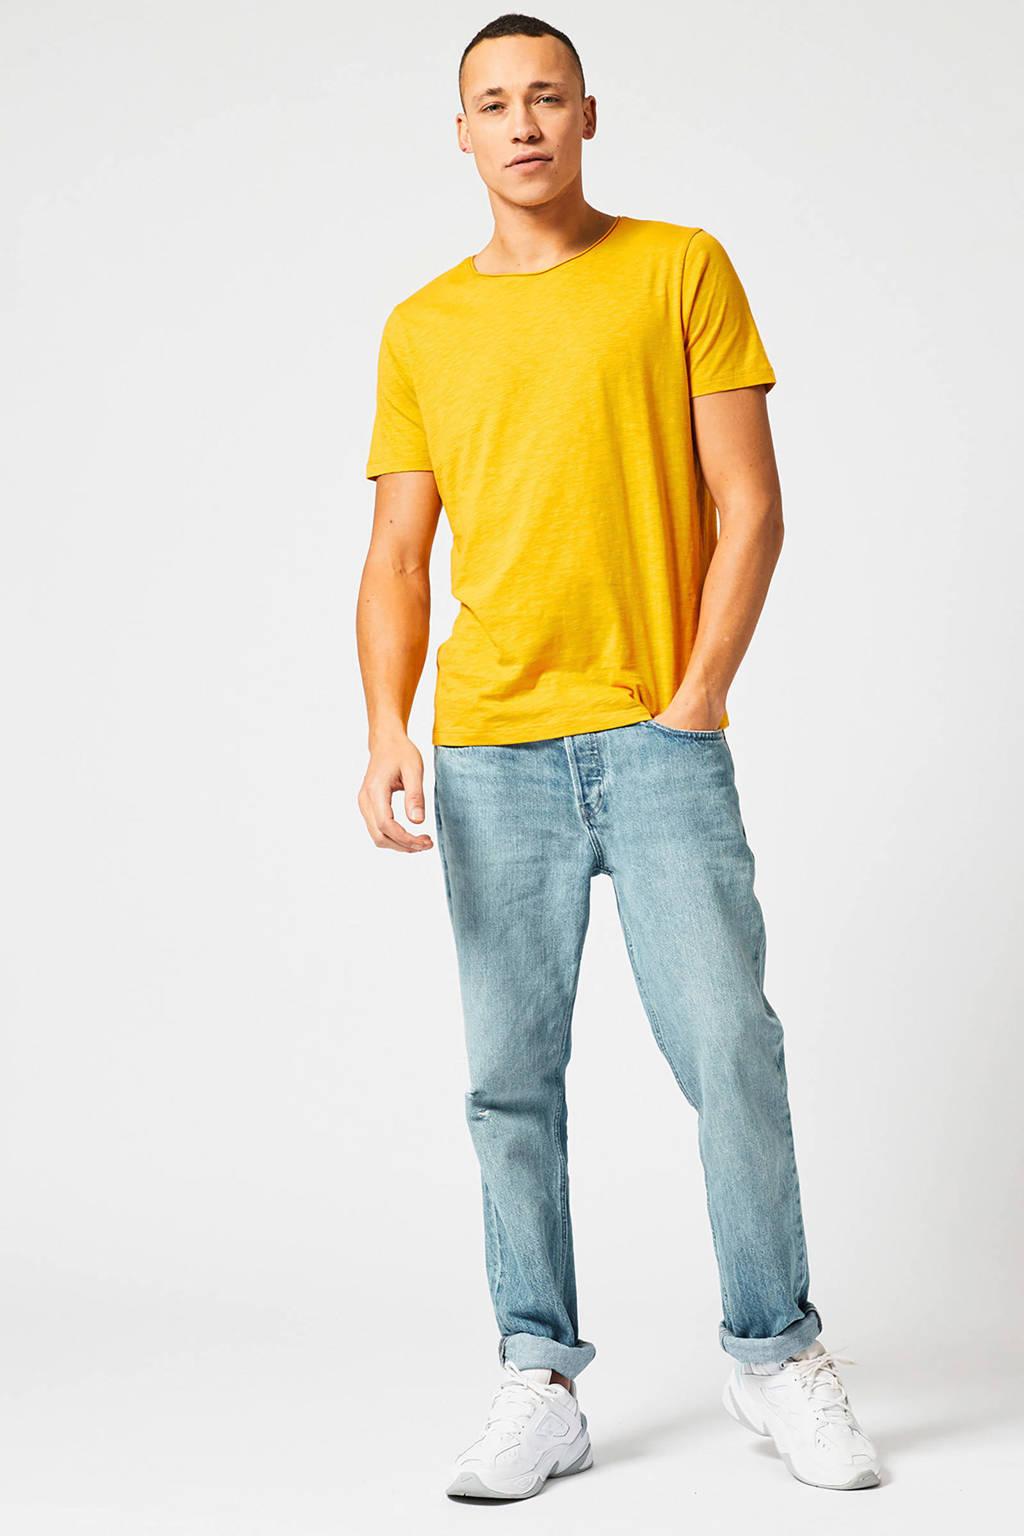 America Today gemêleerd T-shirt geel, Geel